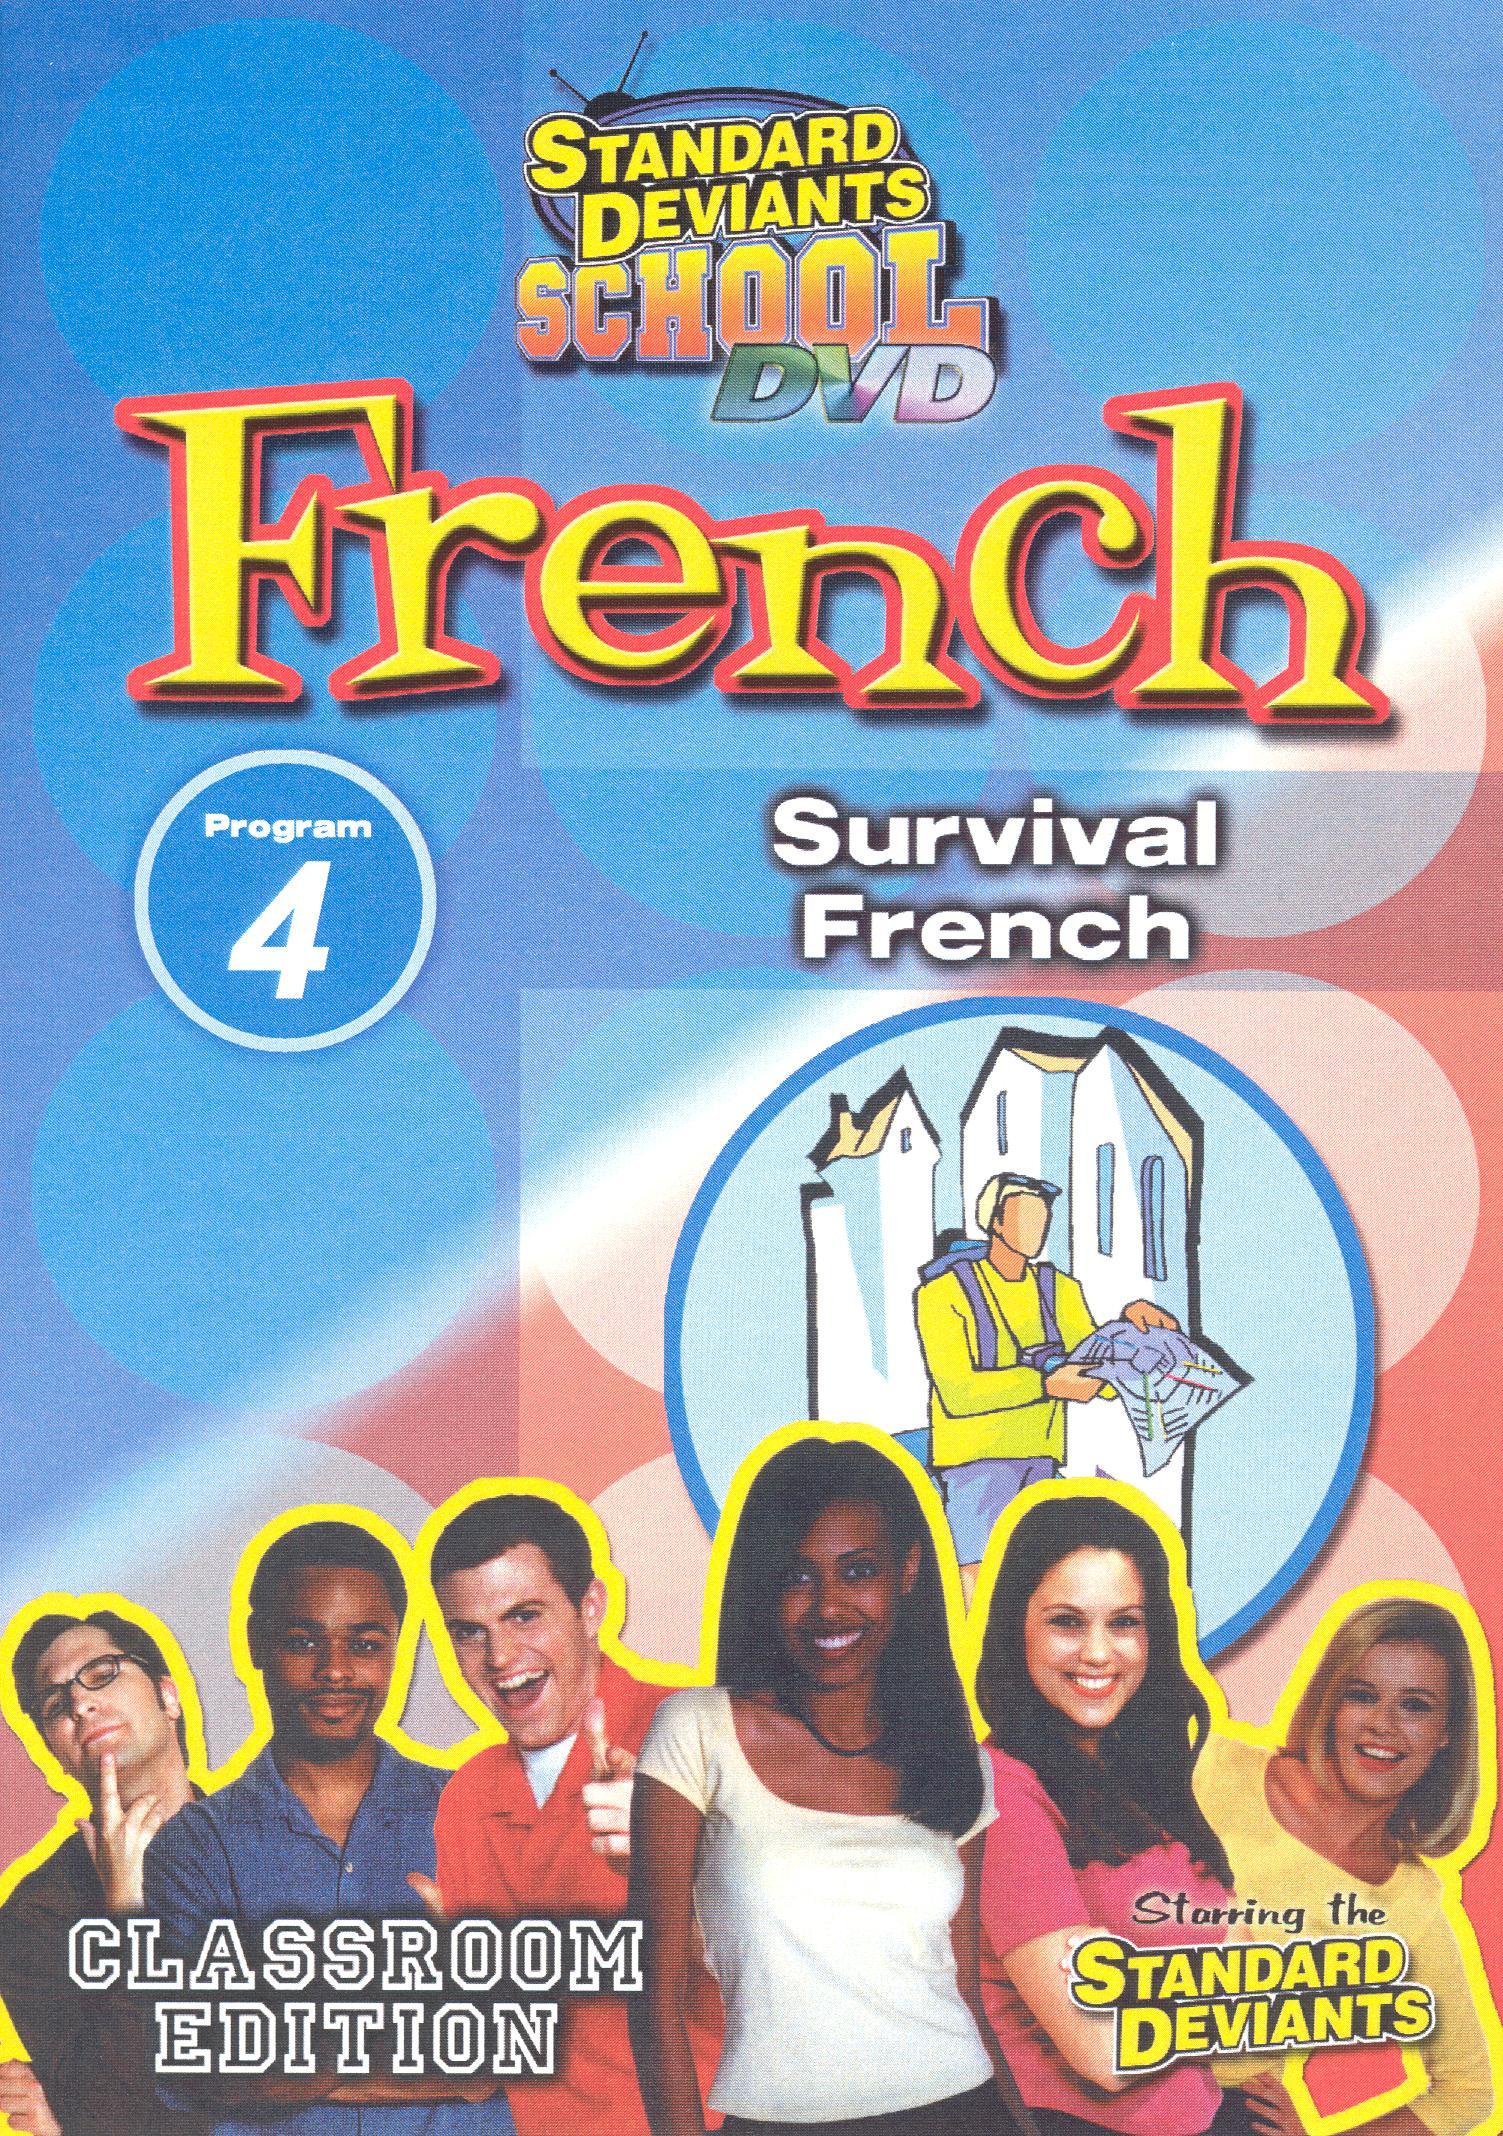 Standard Deviants School: French, Program 4